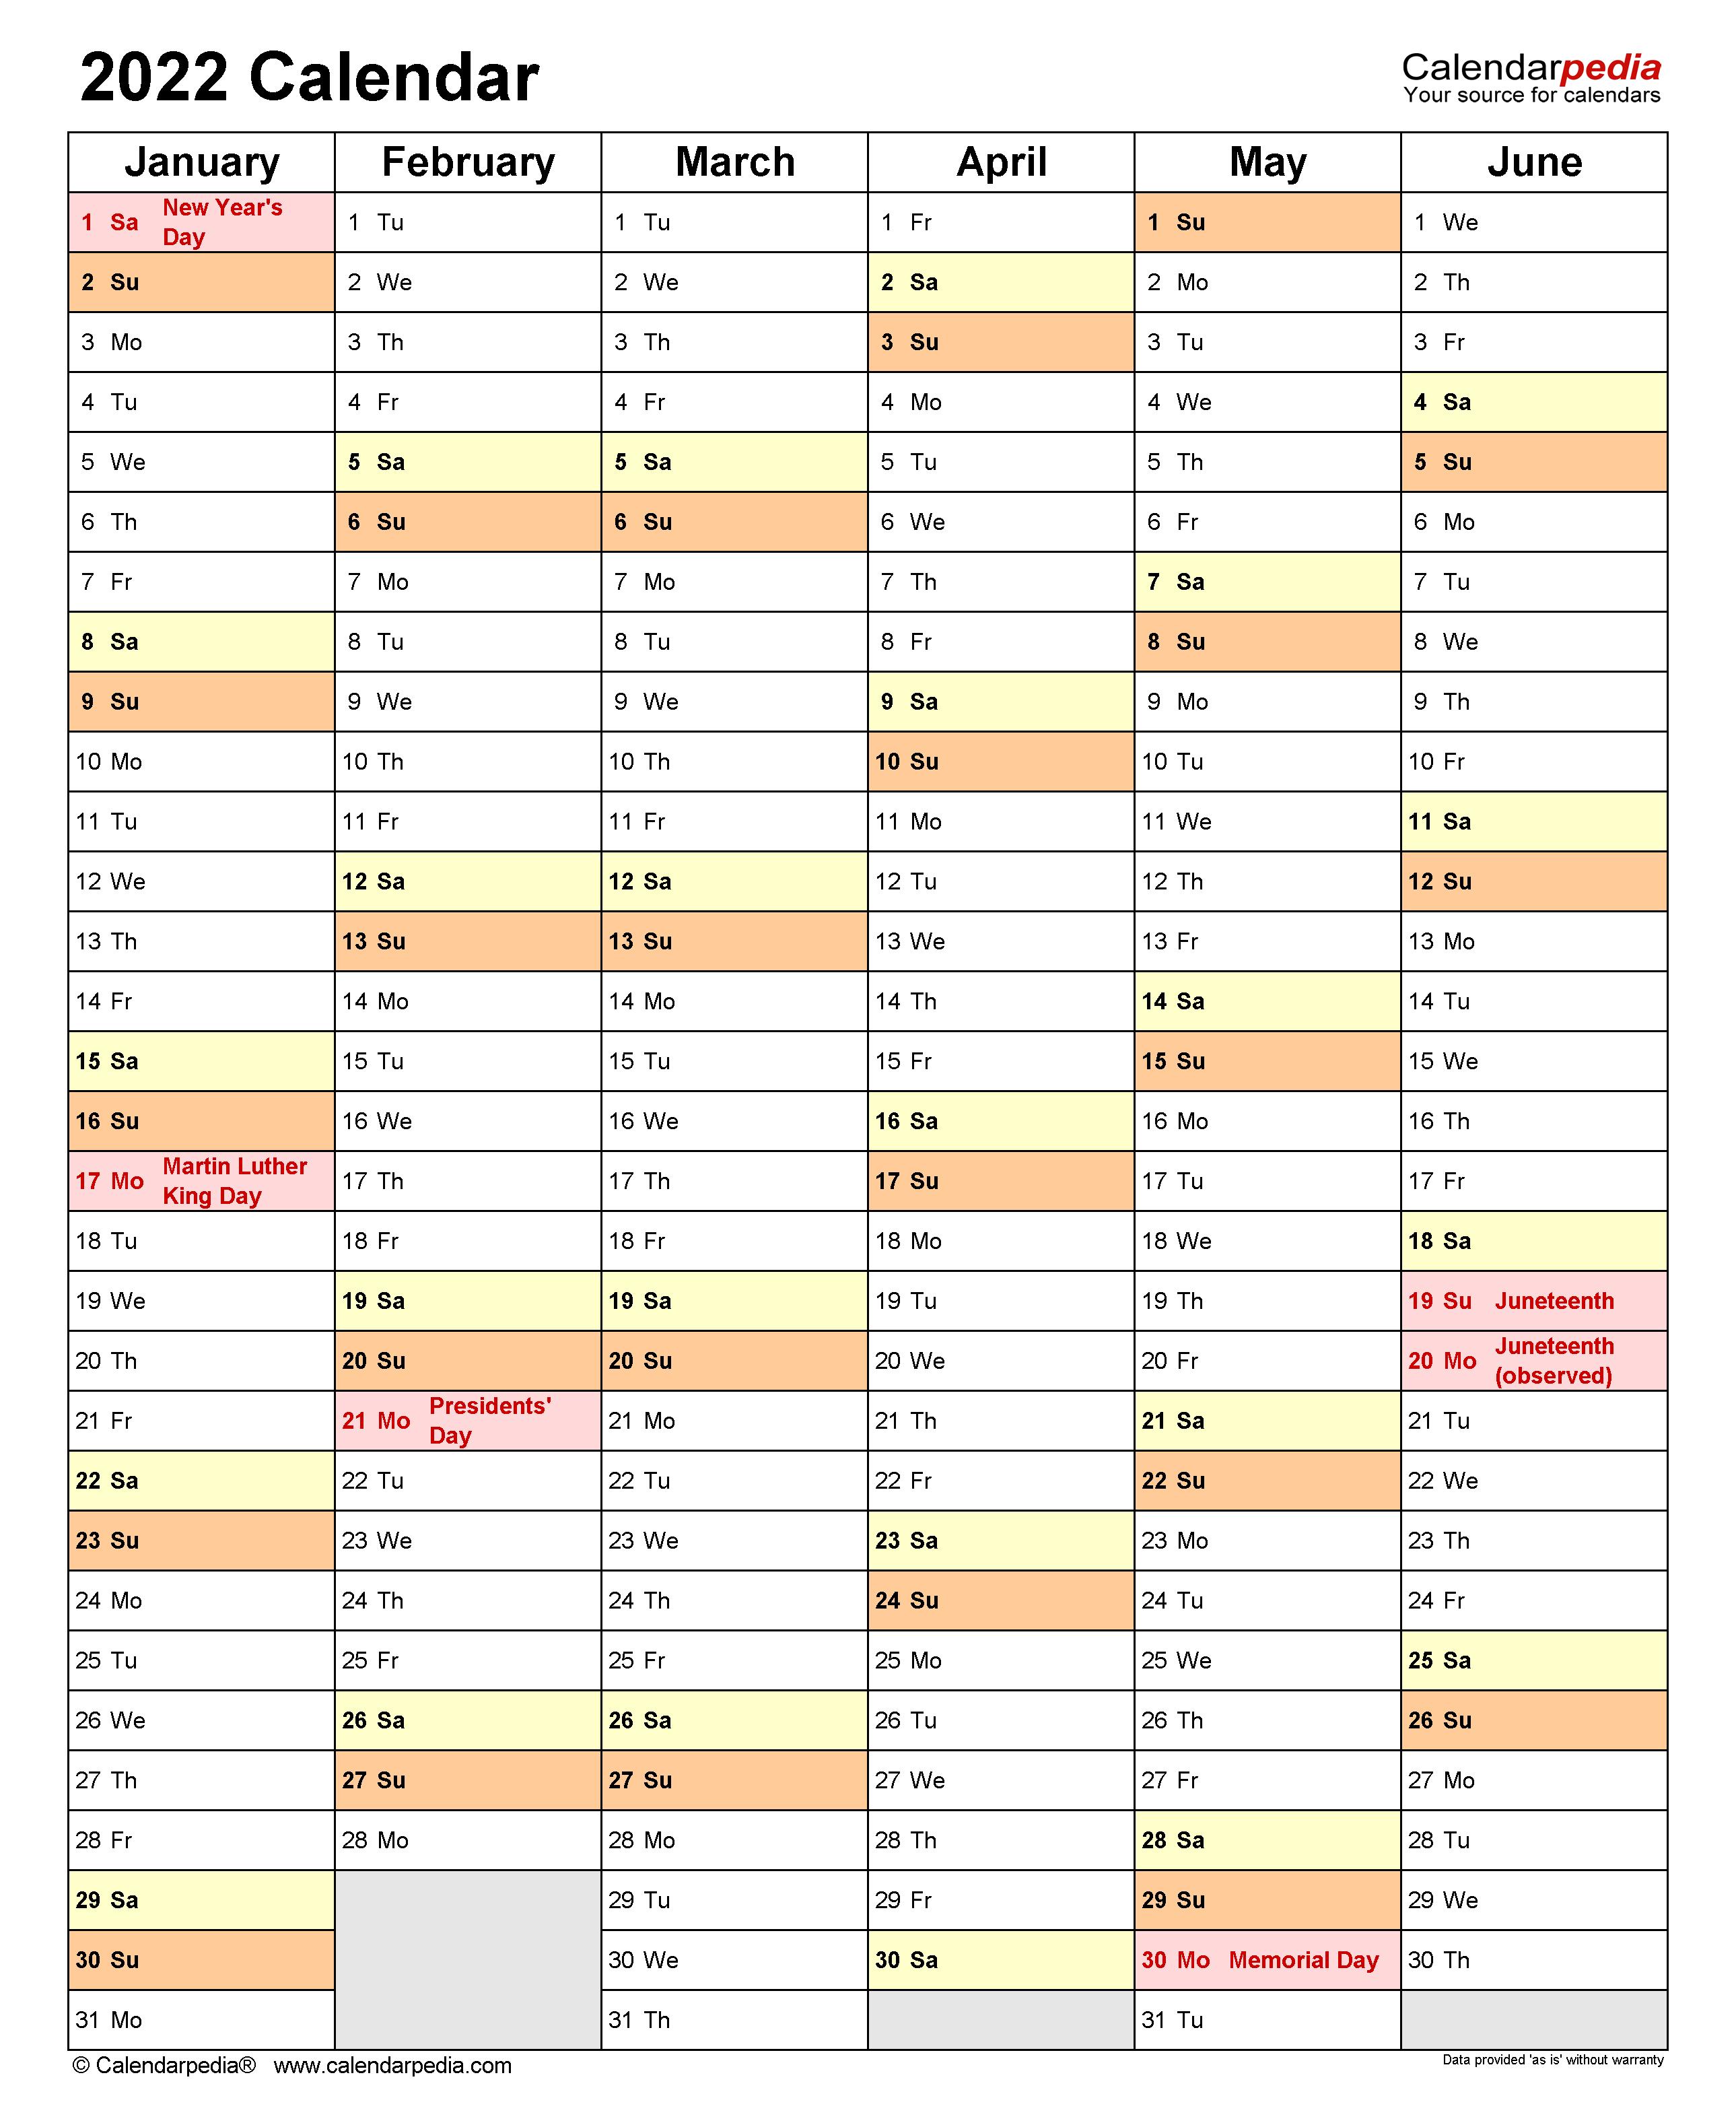 2022 Calendar - Free Printable Templates